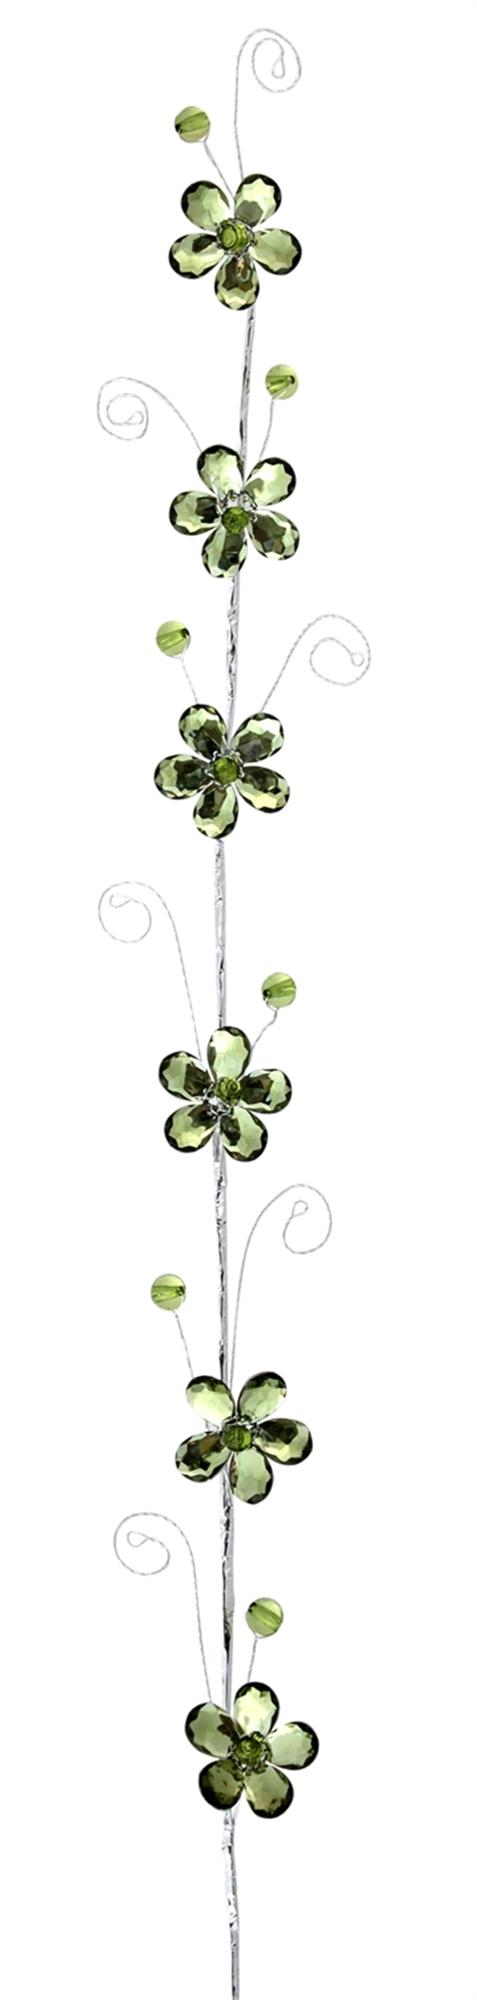 "Flower Garland (Set of 12) 30""L Acrylic"